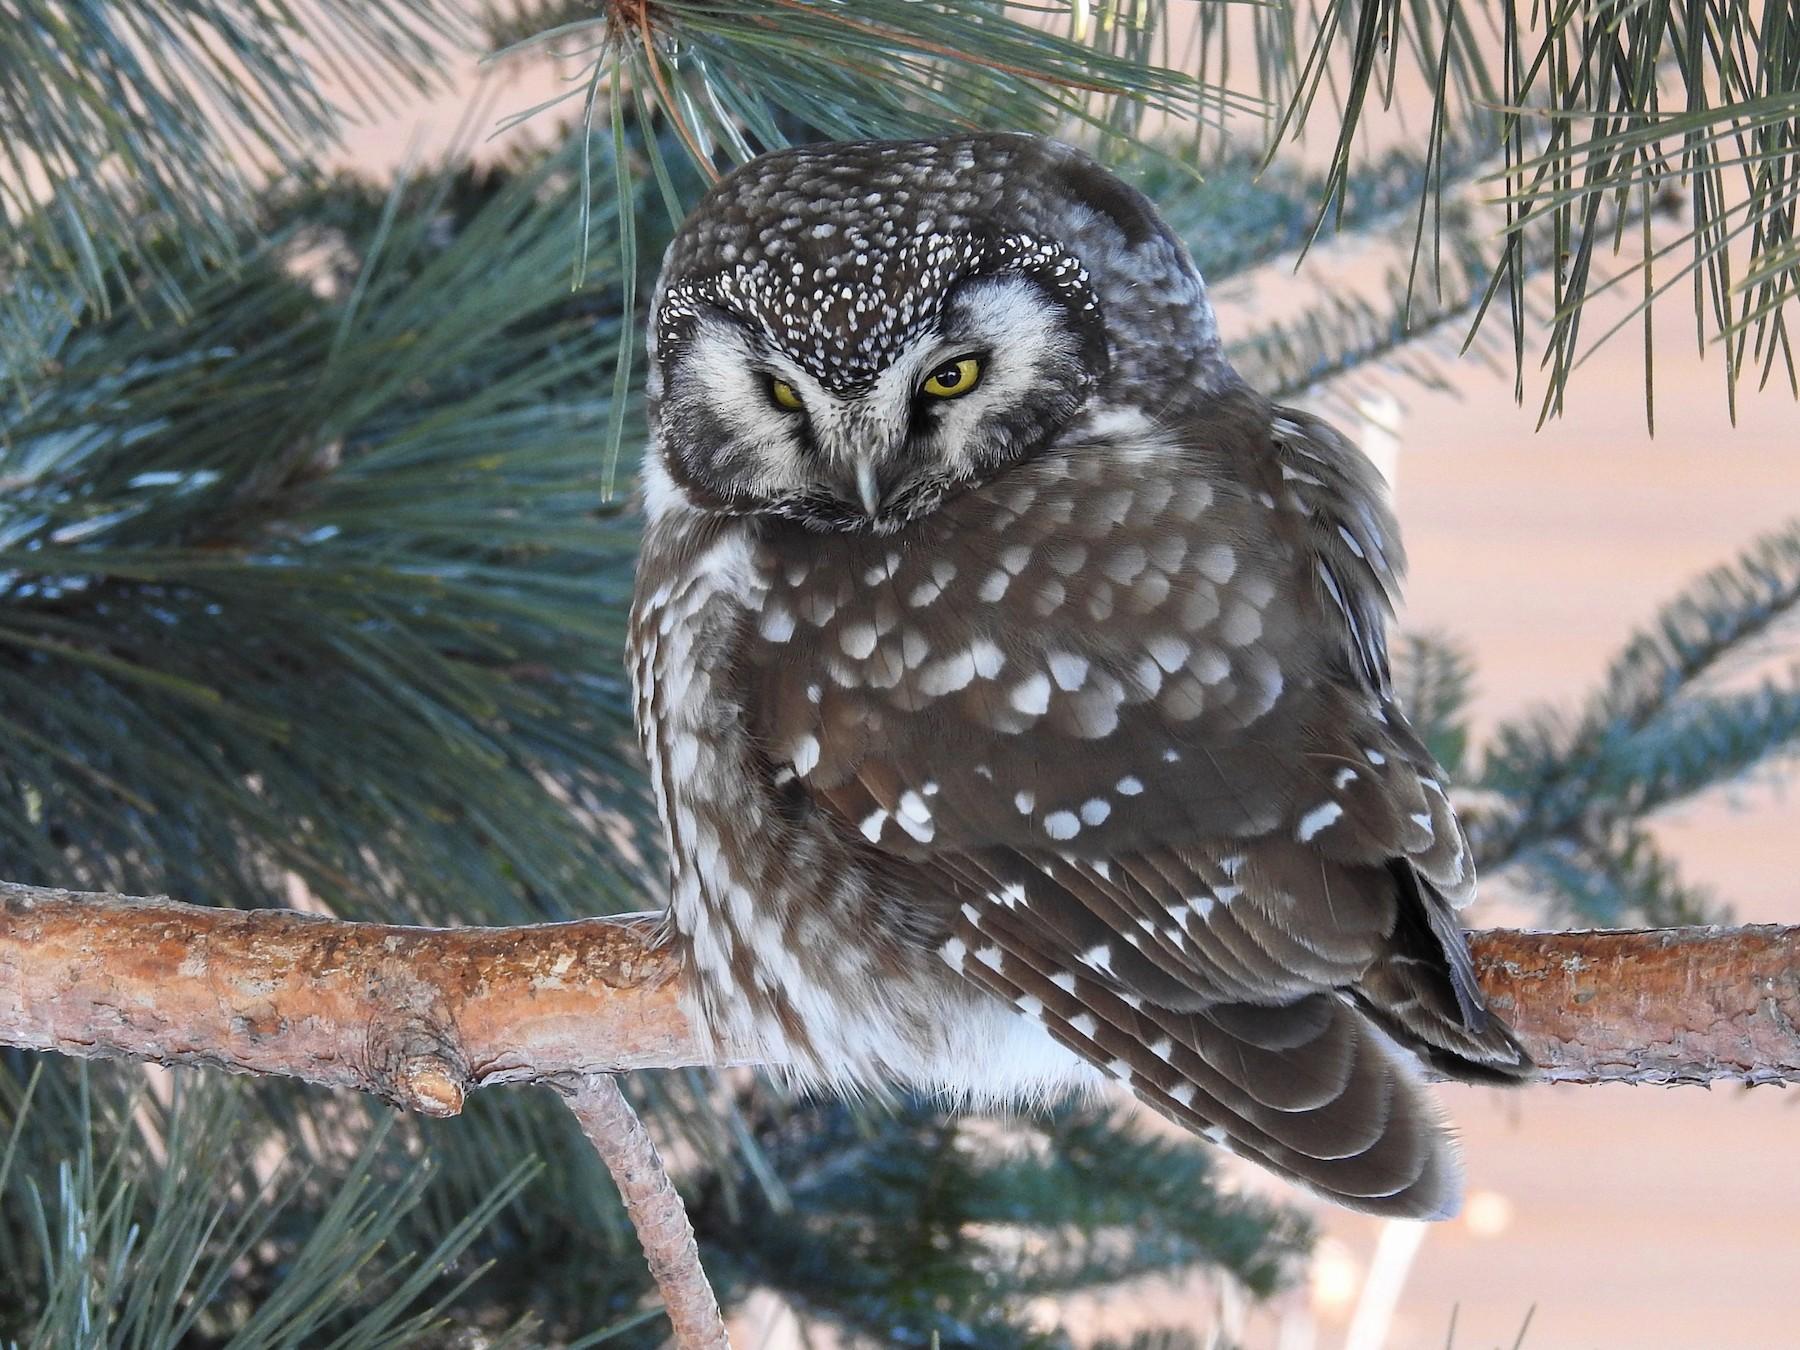 Boreal Owl - Jean Brislance